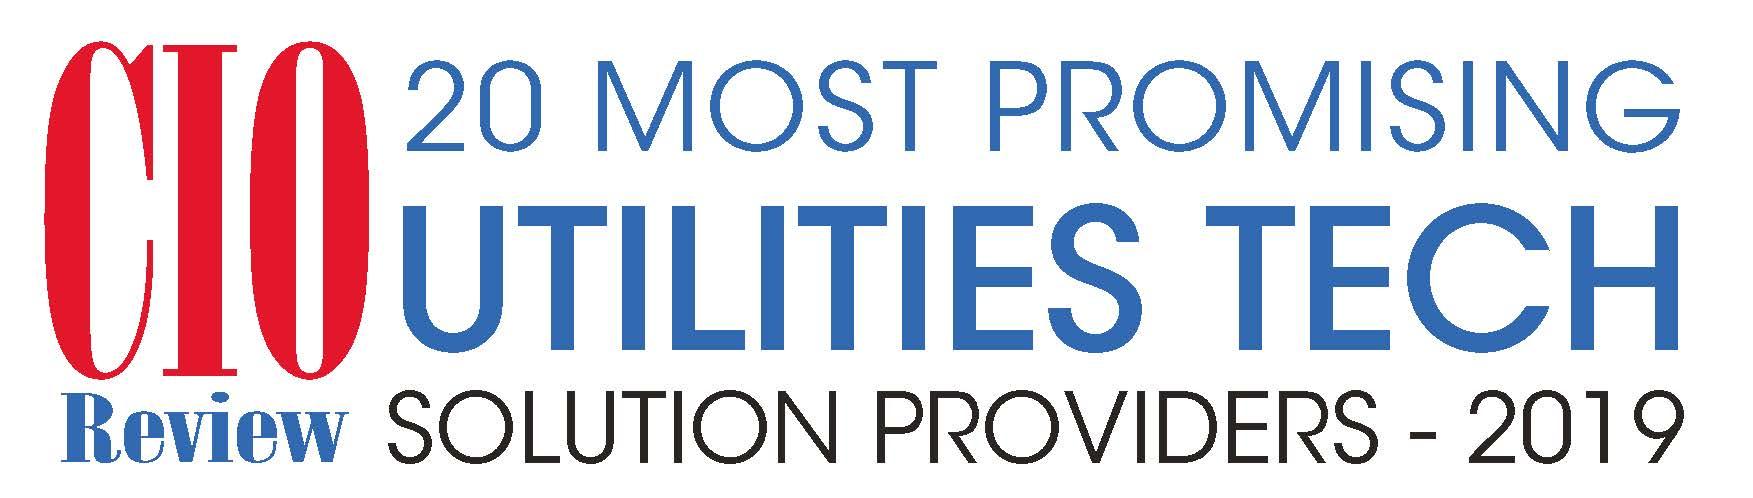 Utilities Solutions Logo.jpg